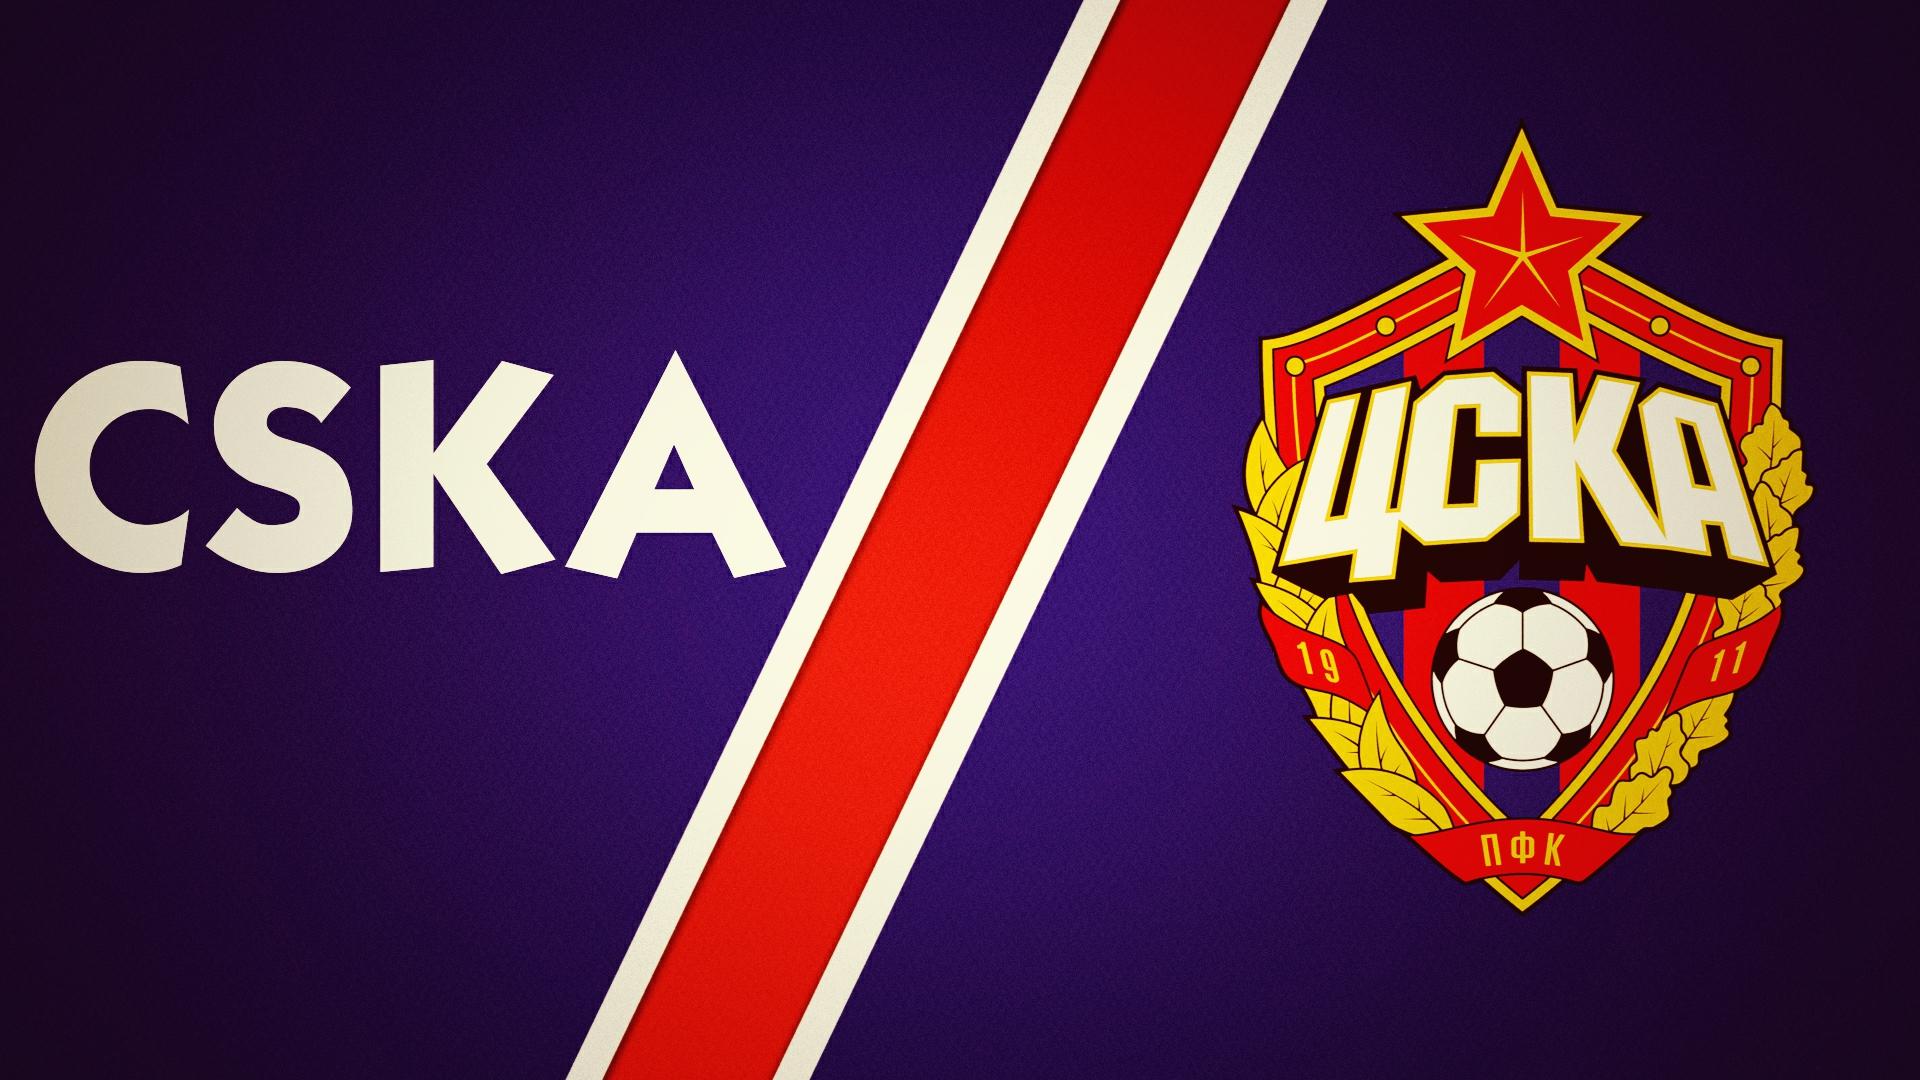 PFC CSKA Moscow HD Wallpaper Background Image 1920x1080 ID 1920x1080